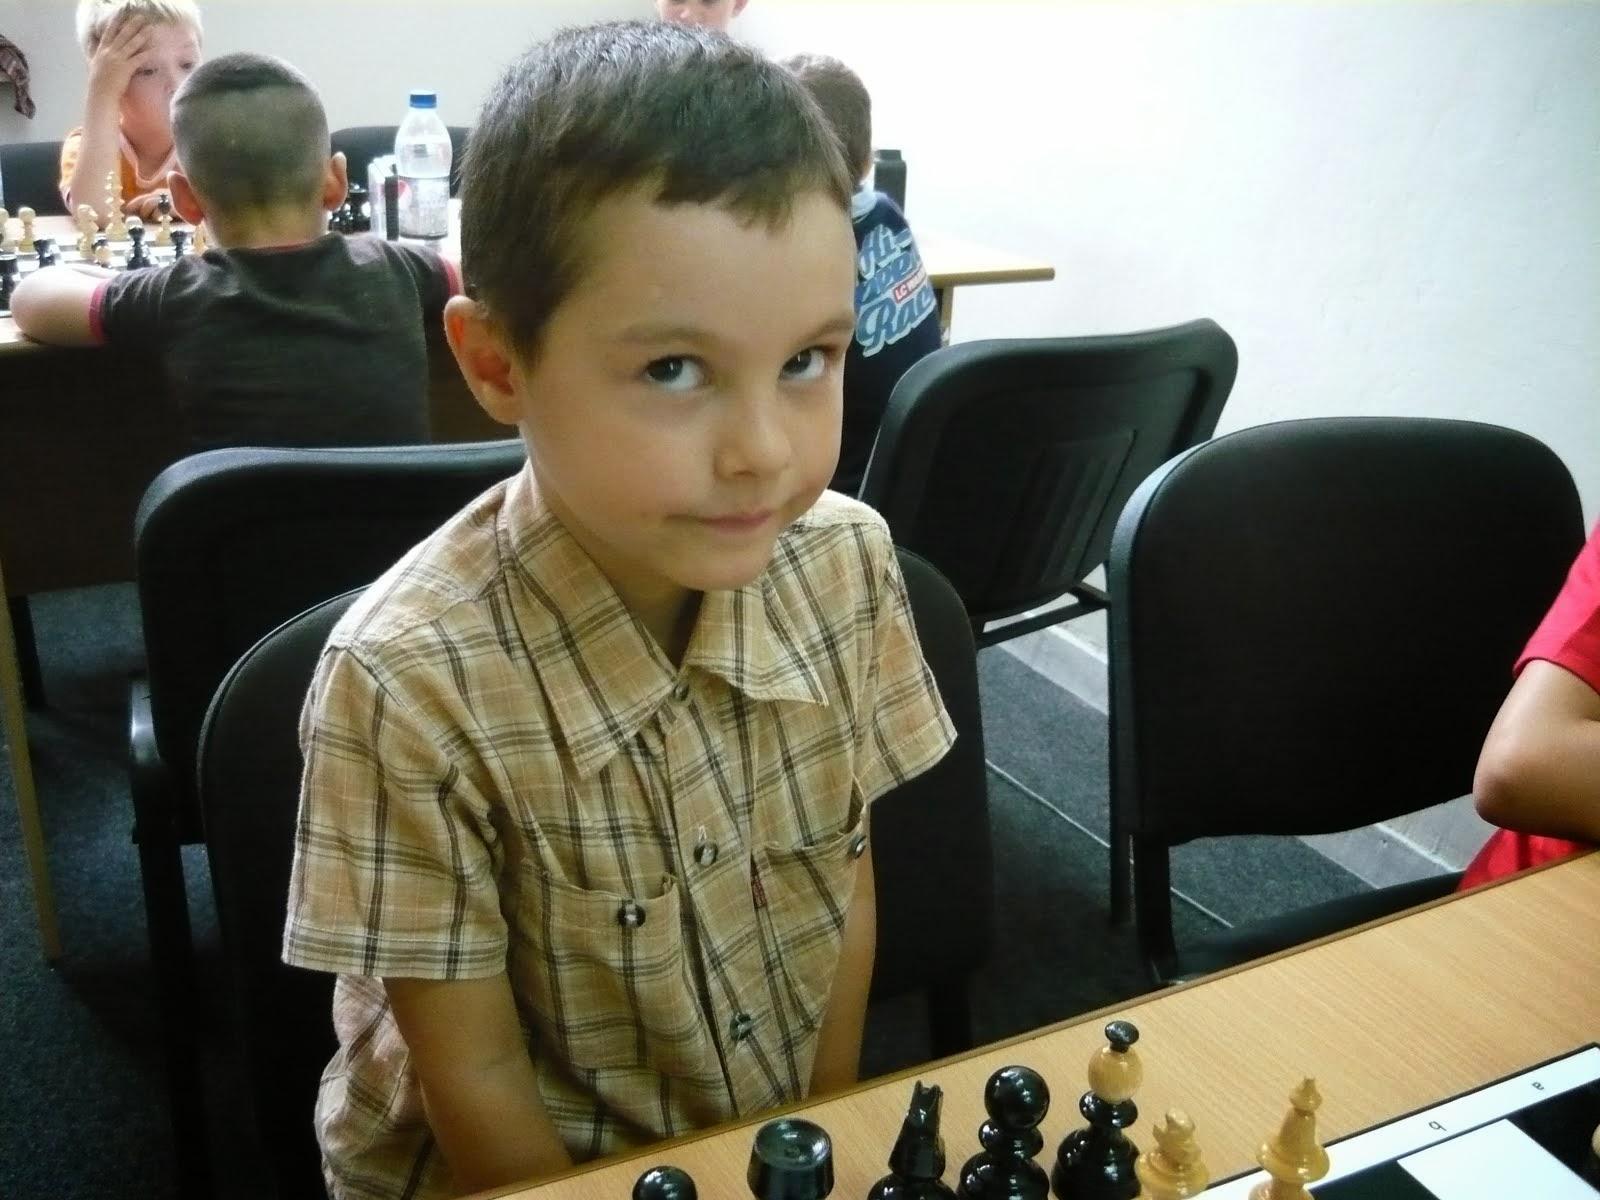 VĂTĂȘELU ROBERT - ANDREI